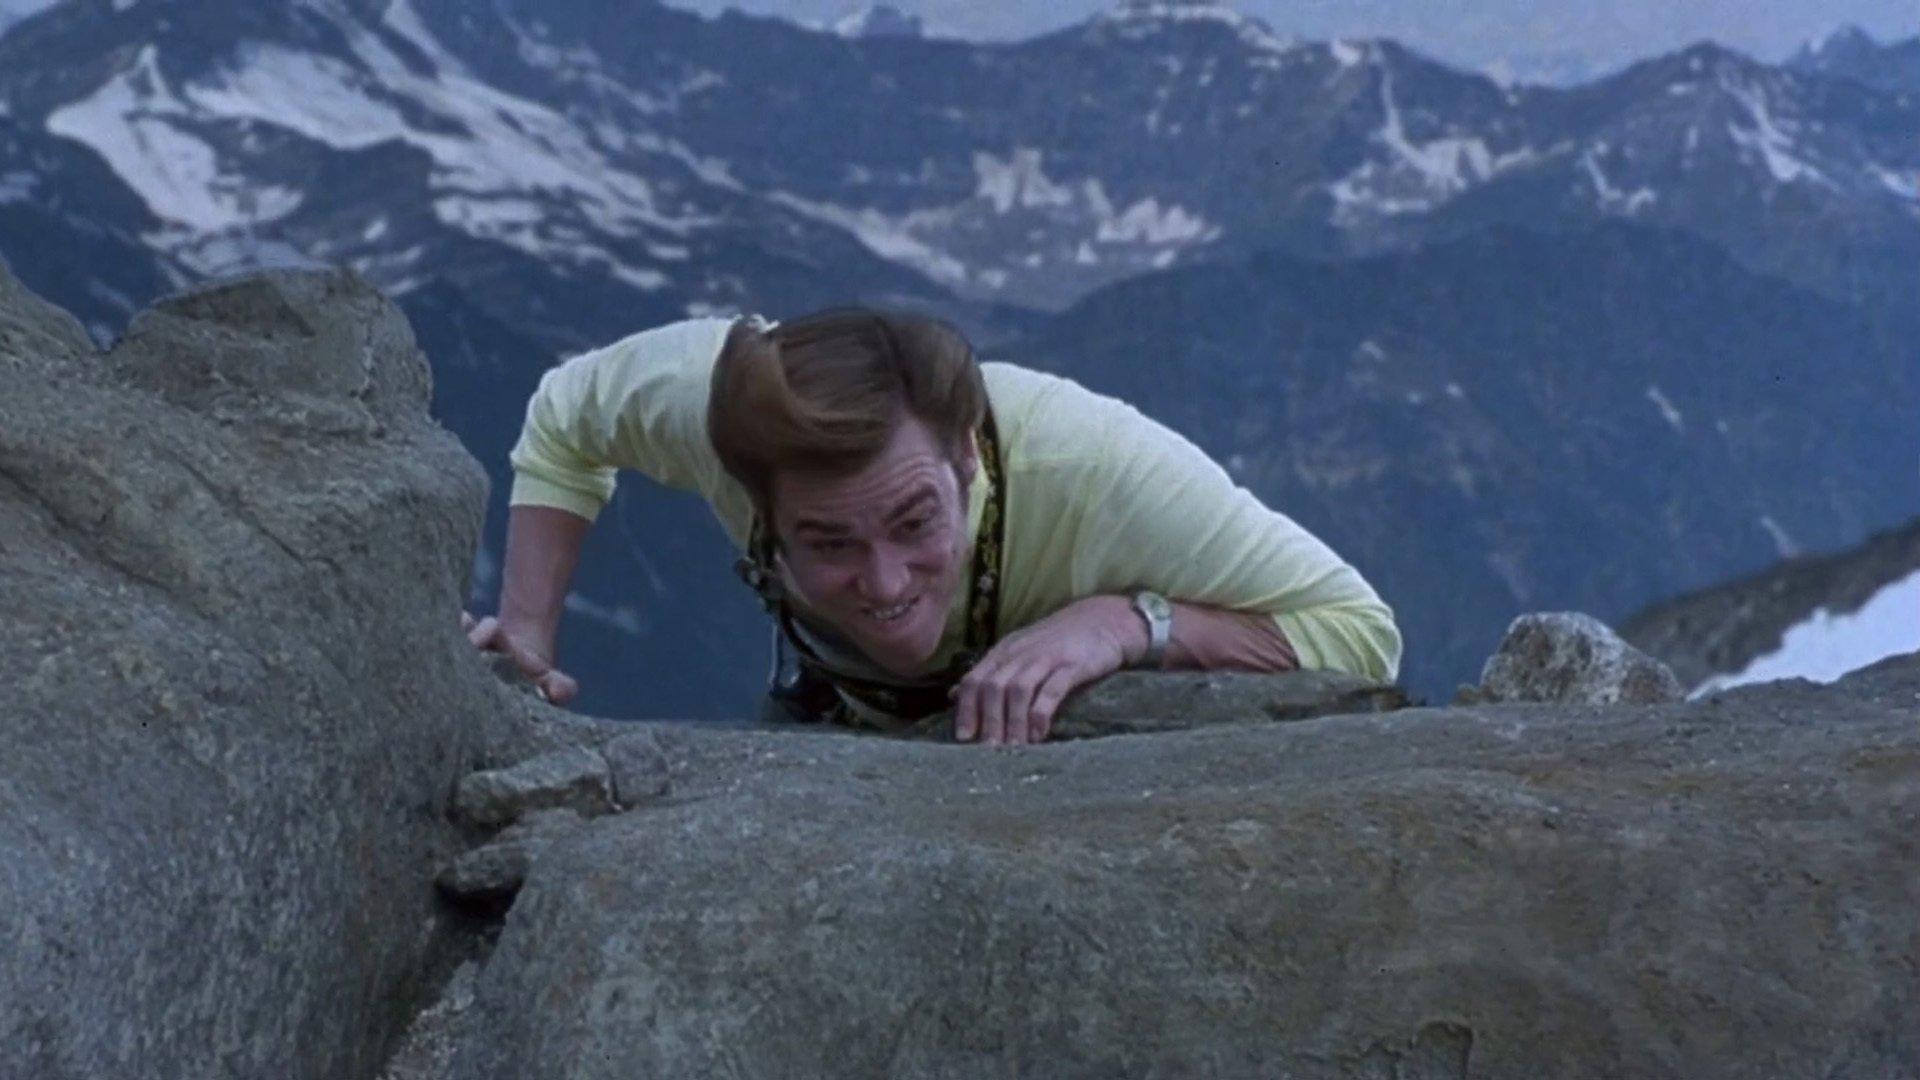 ACE VENTURA: WHEN NATURE CALLS 1995 Warner Bros film with